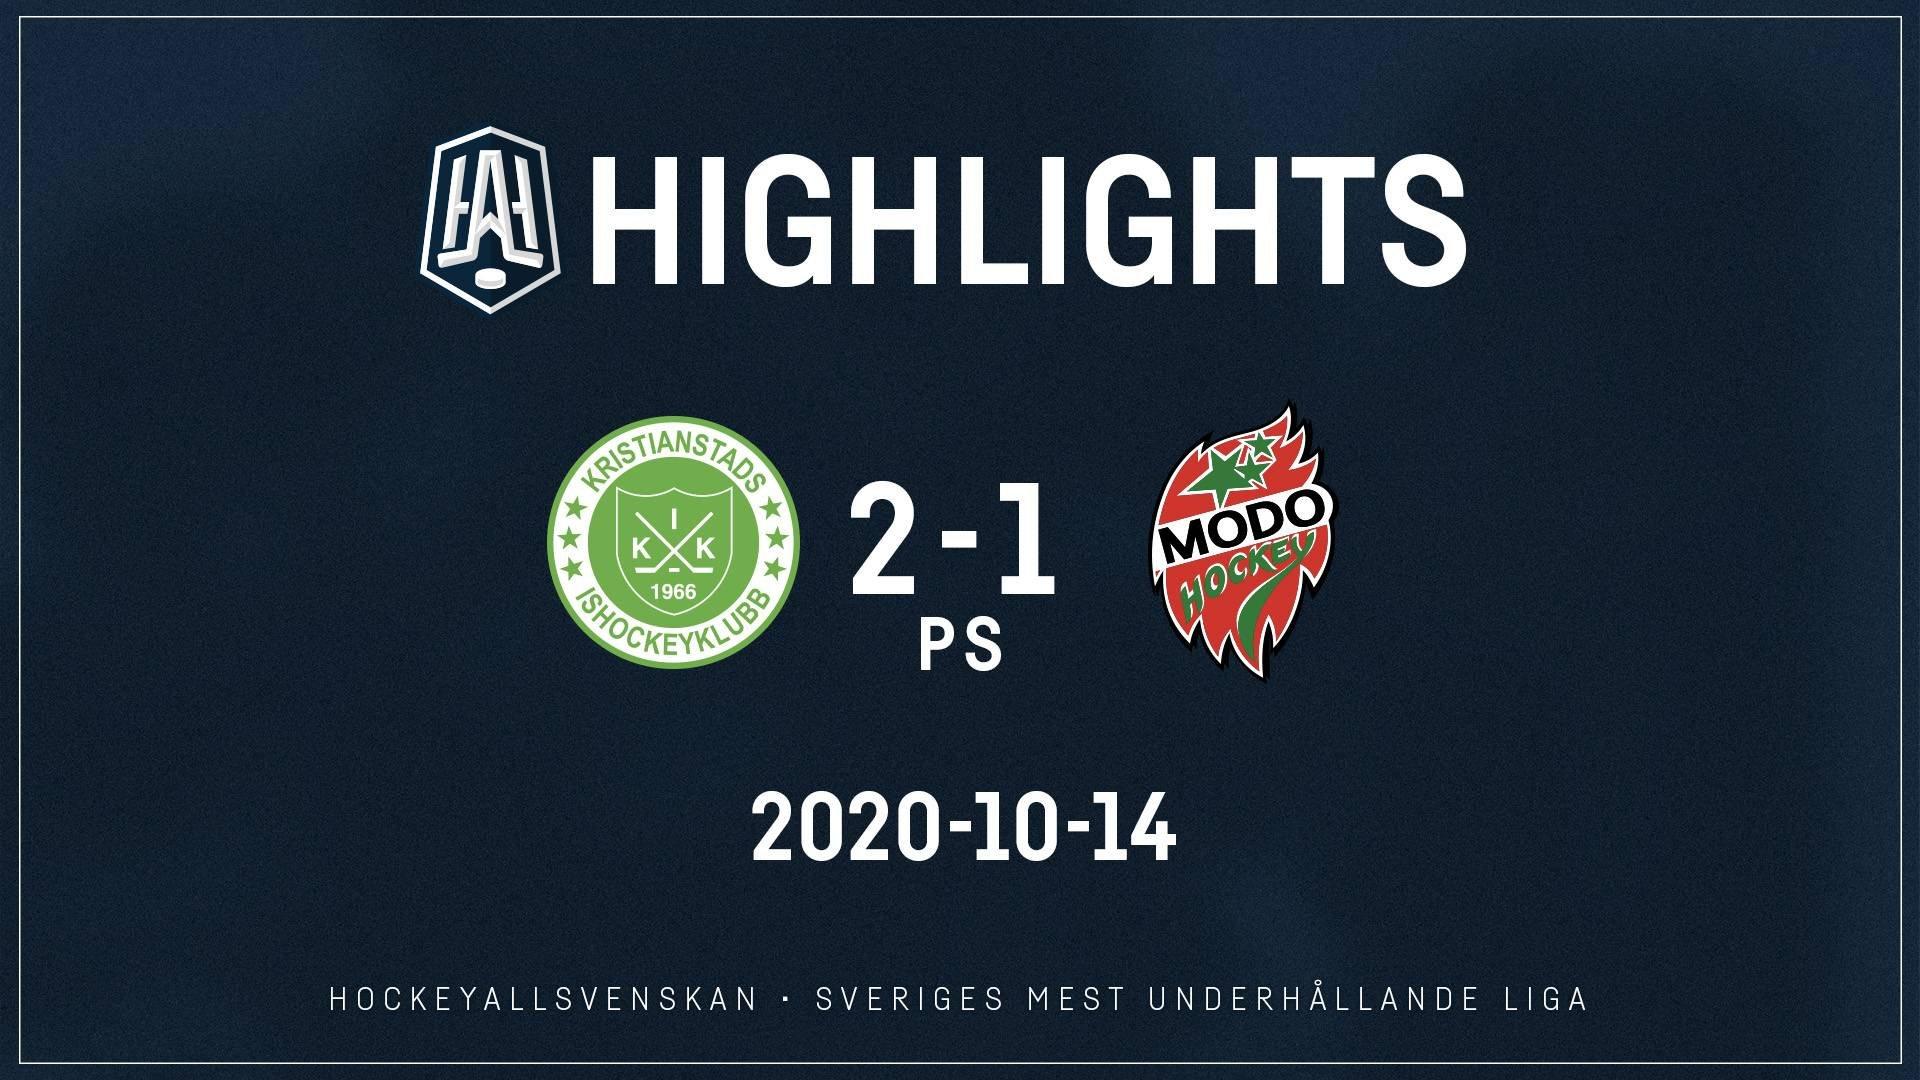 2020-10-14 Kristianstad - MODO 2-1 (PS)